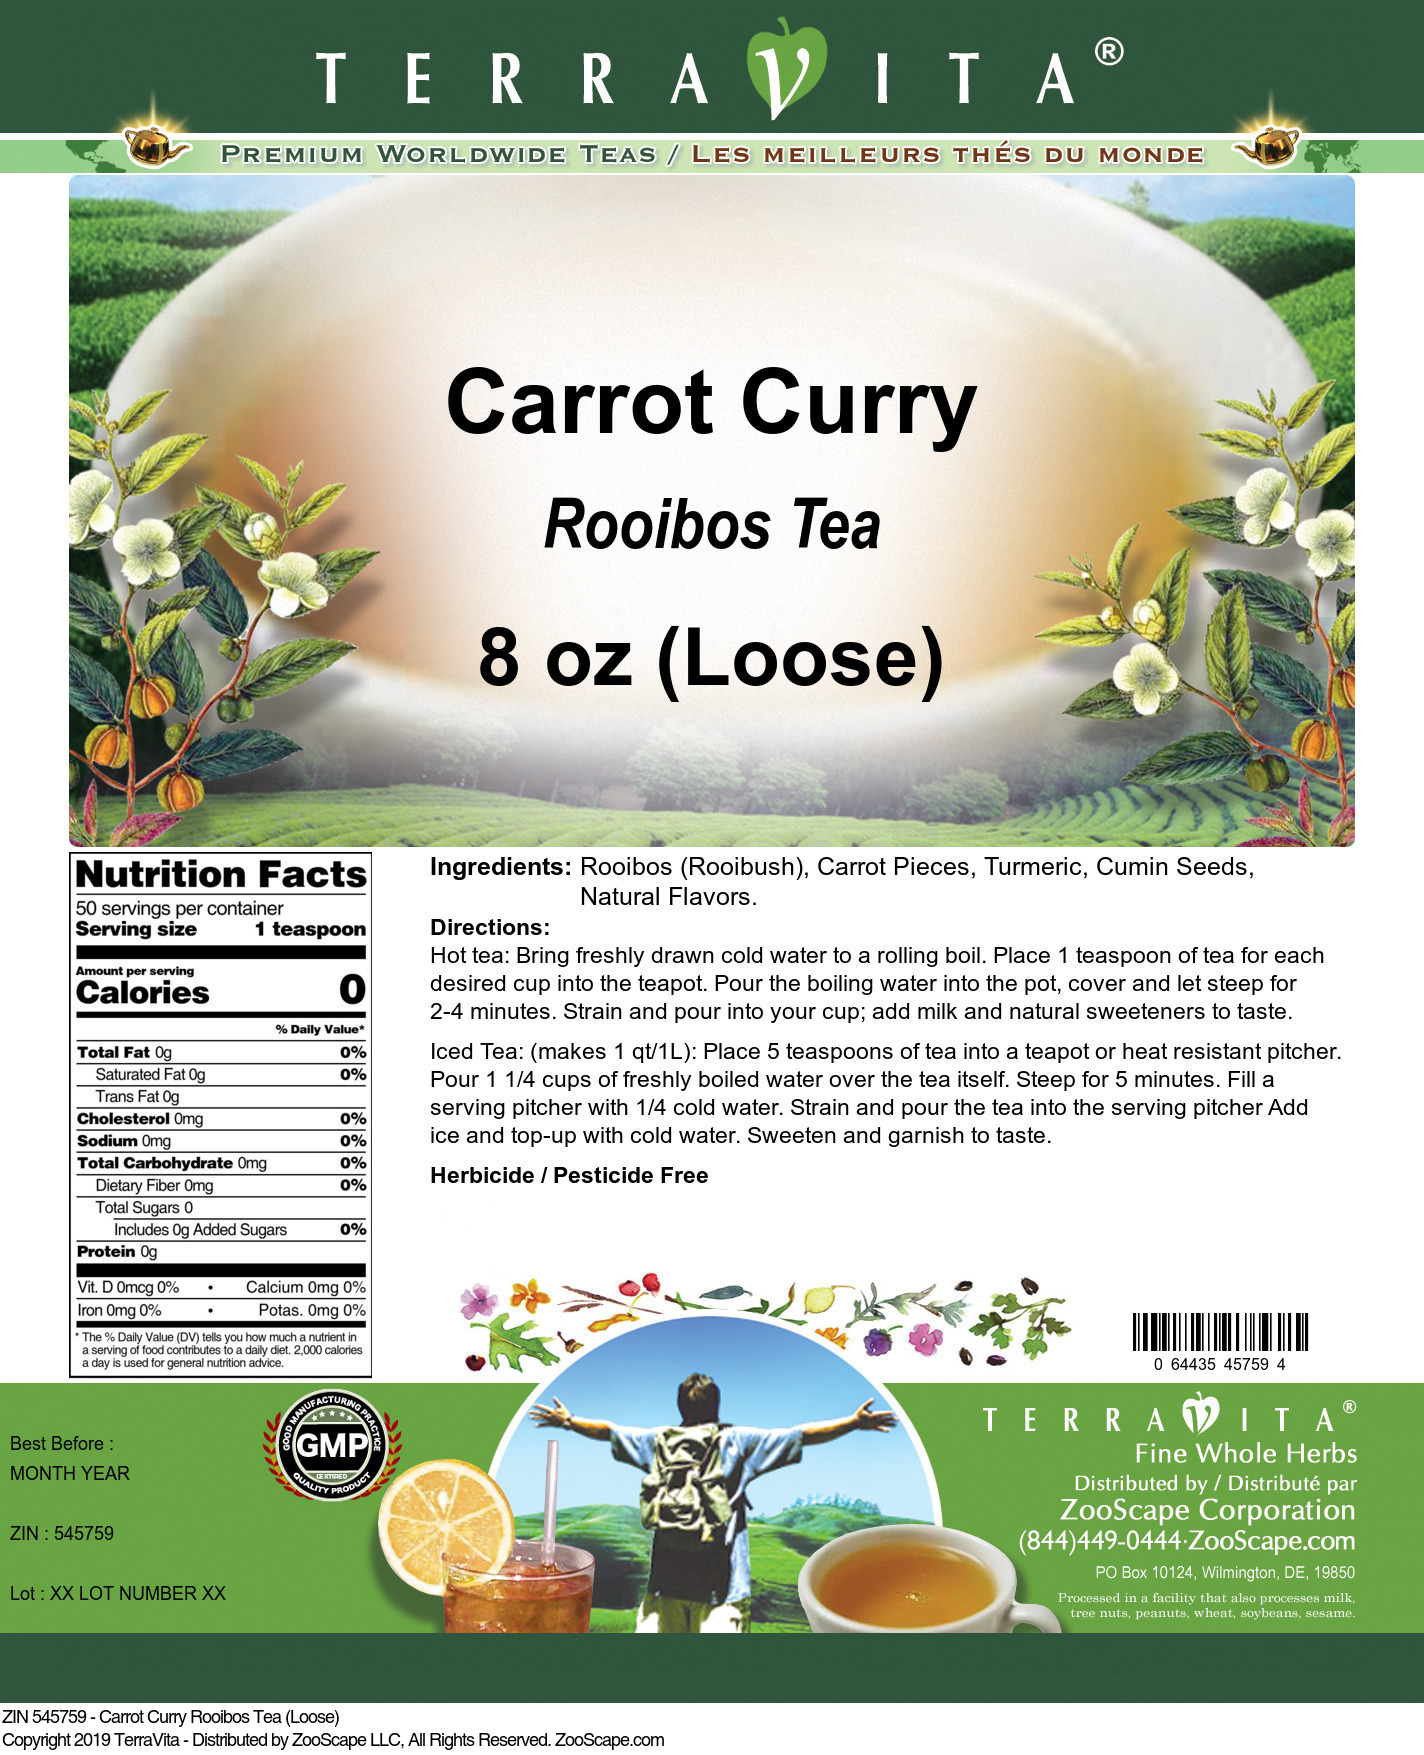 Carrot Curry Rooibos Tea